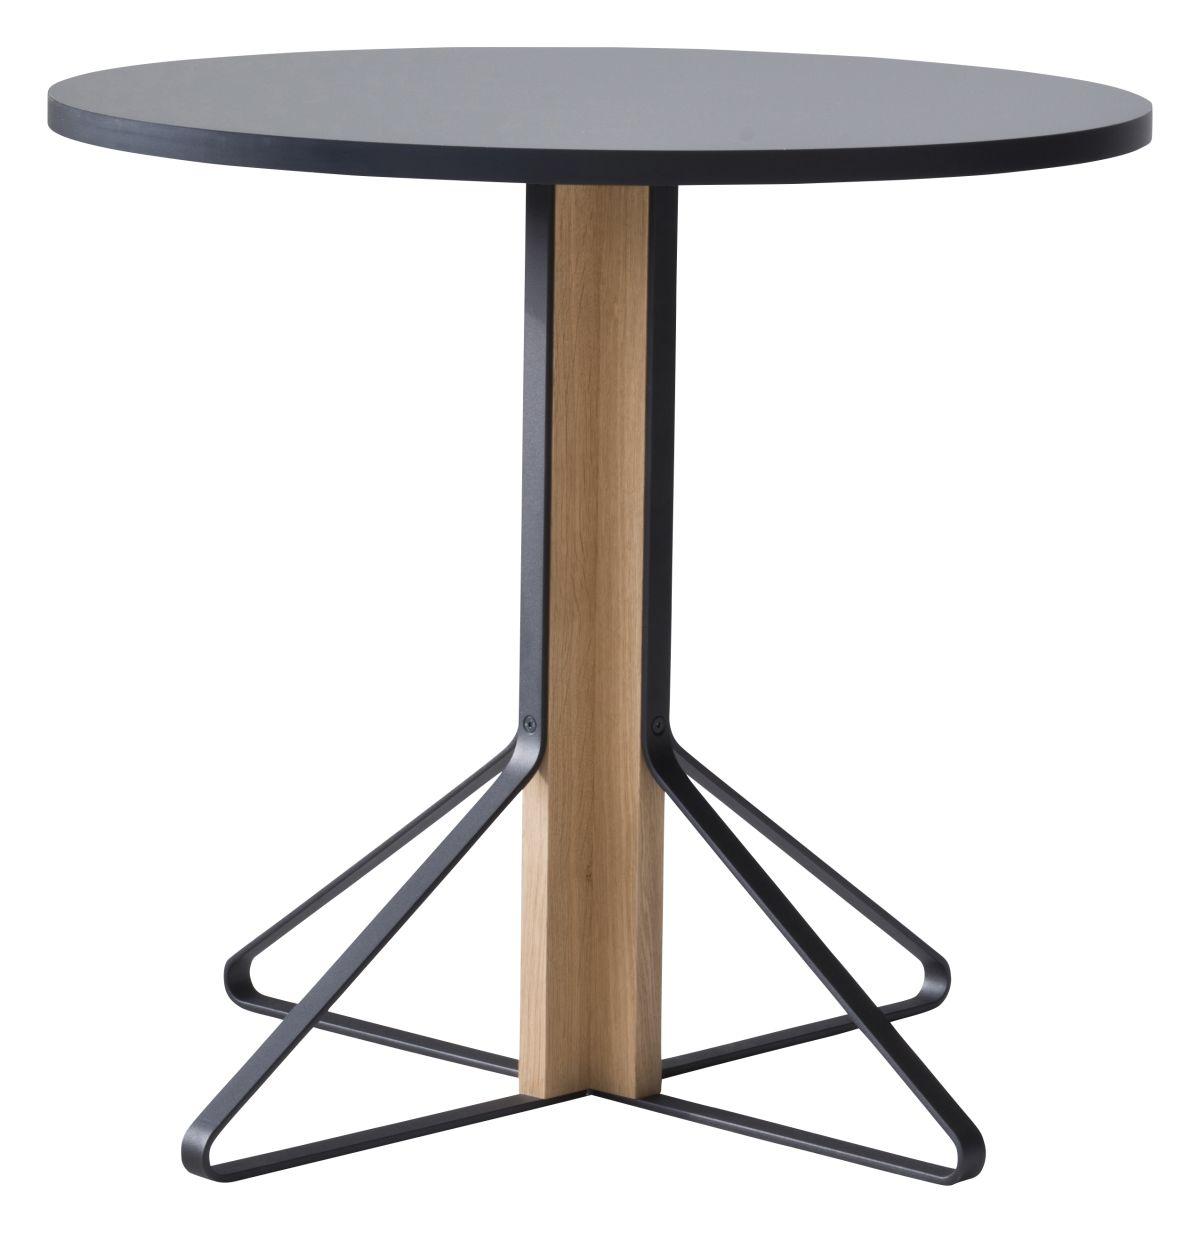 Kaari Table round REB003 clear protective varnish